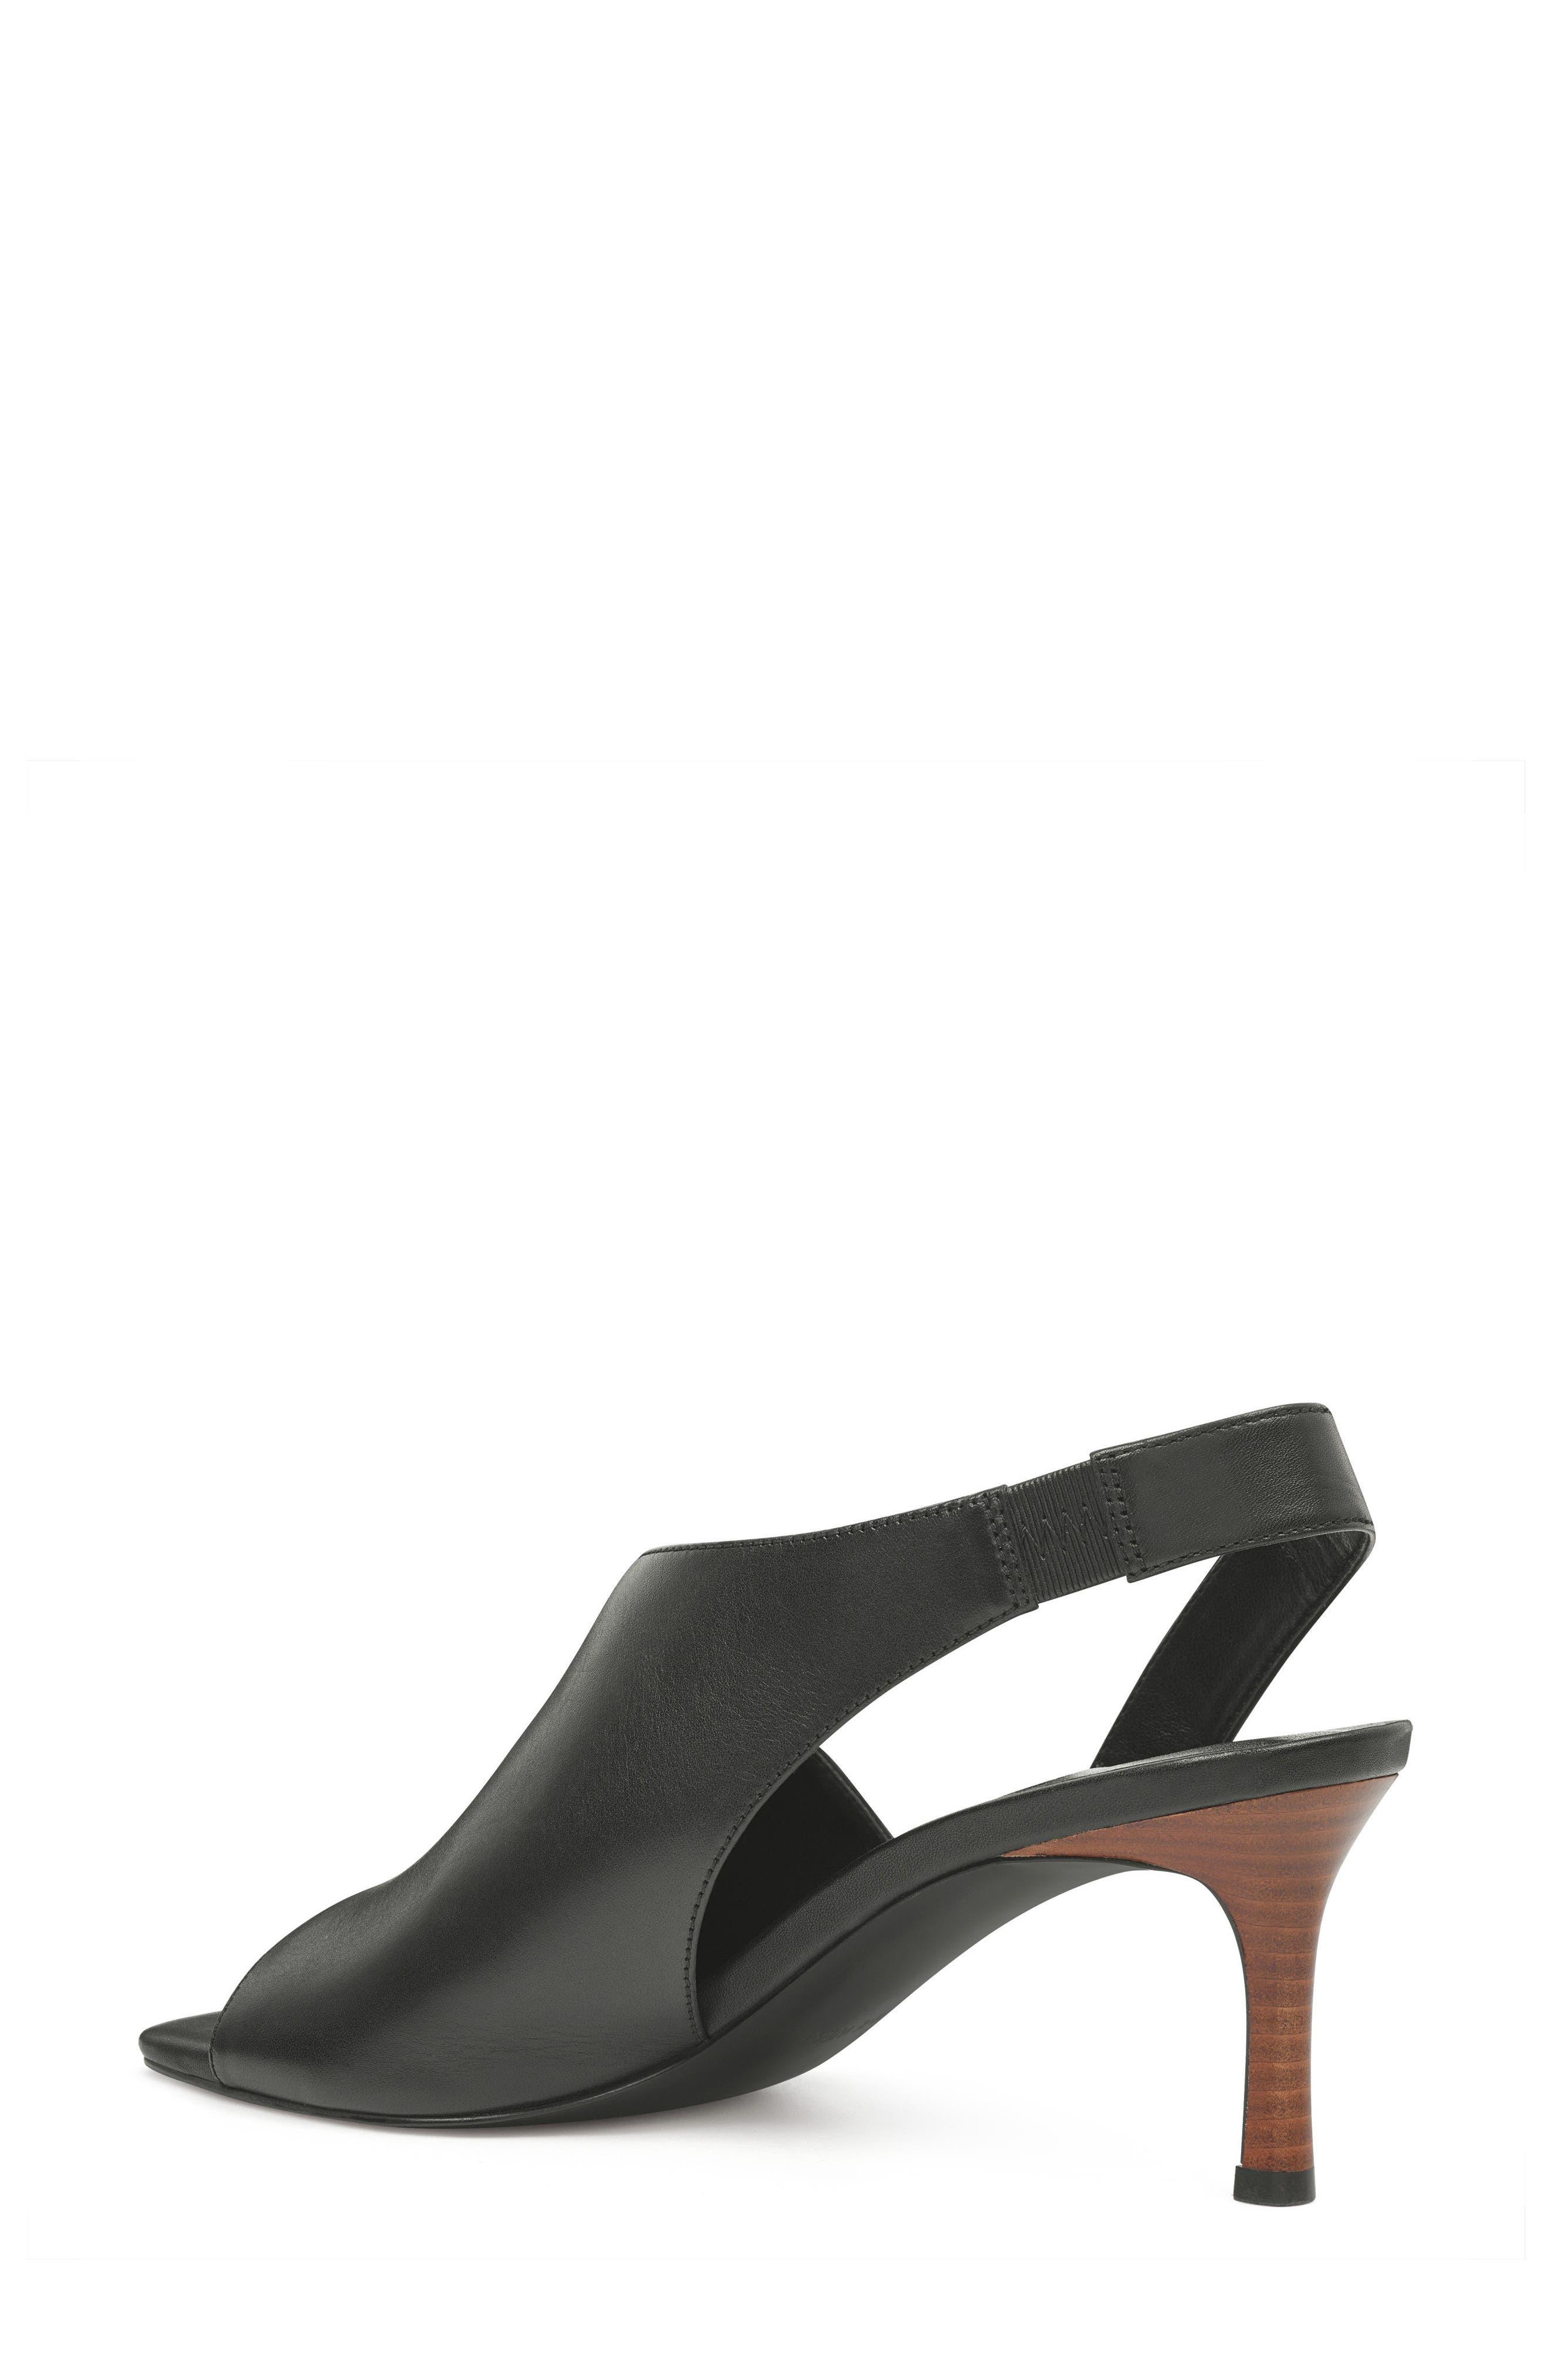 Orrus Asymmetrical Sandal,                             Alternate thumbnail 2, color,                             001